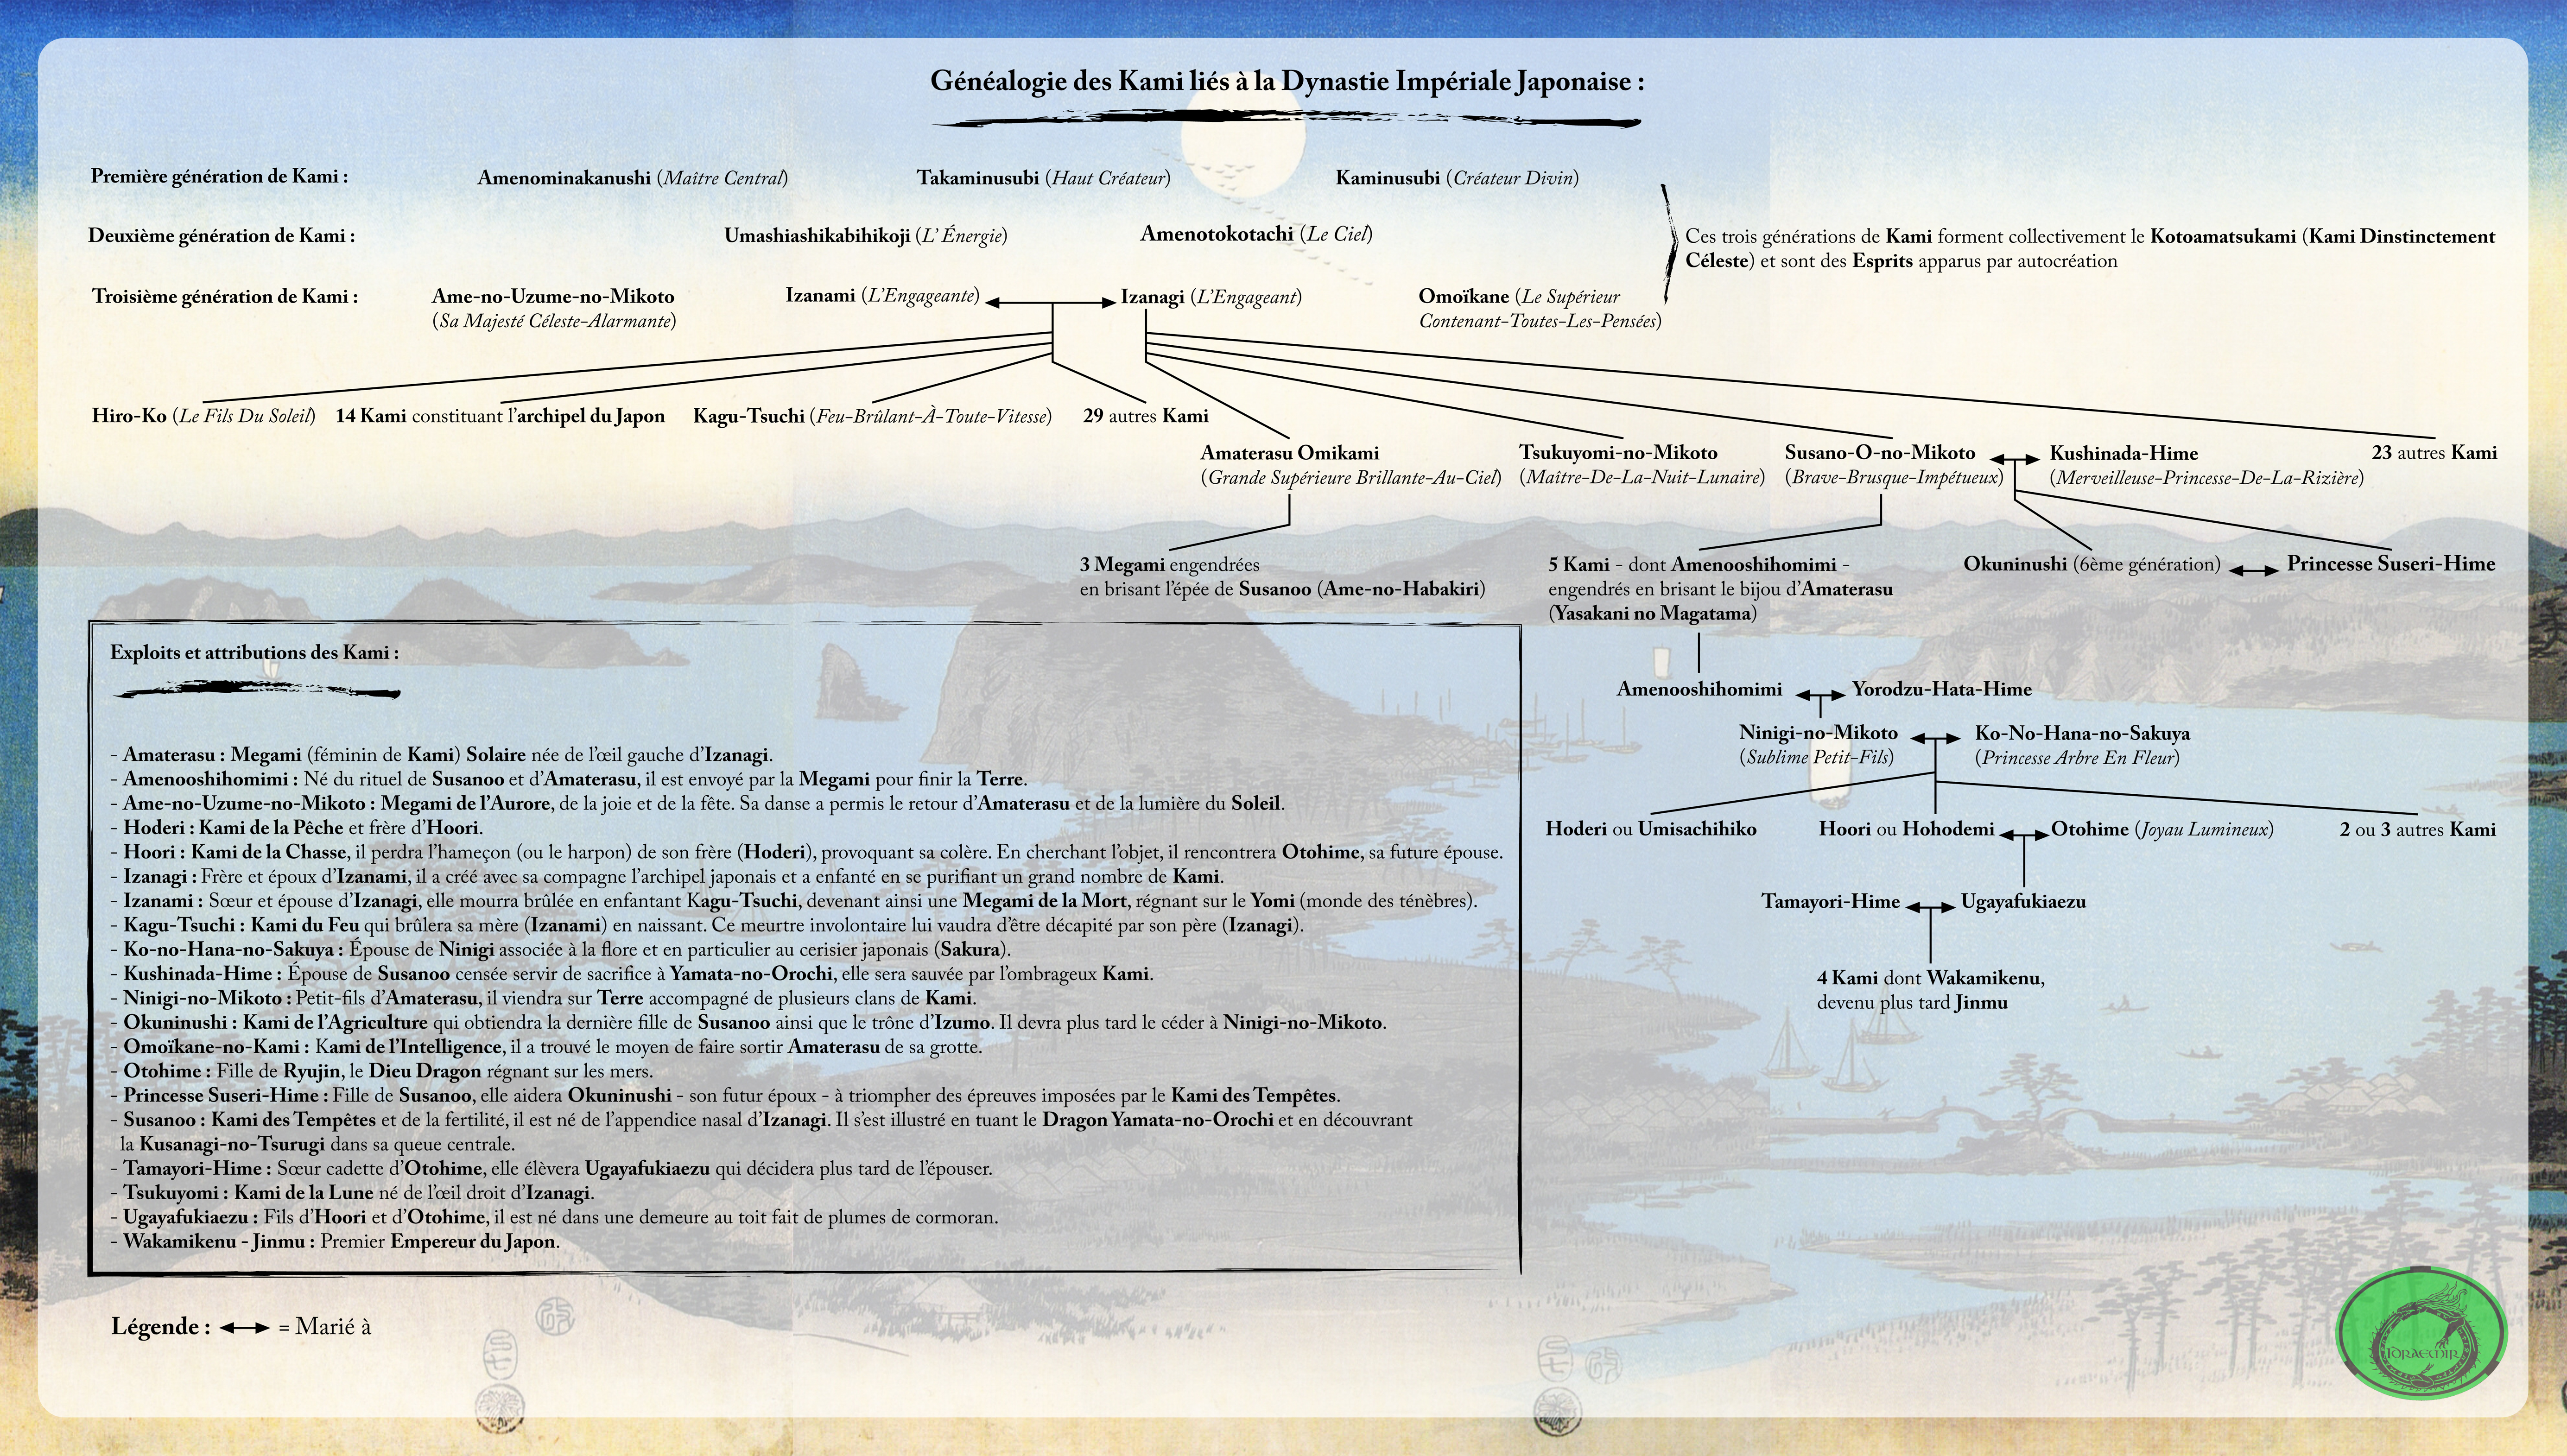 Kami Genealogy by Idraemir